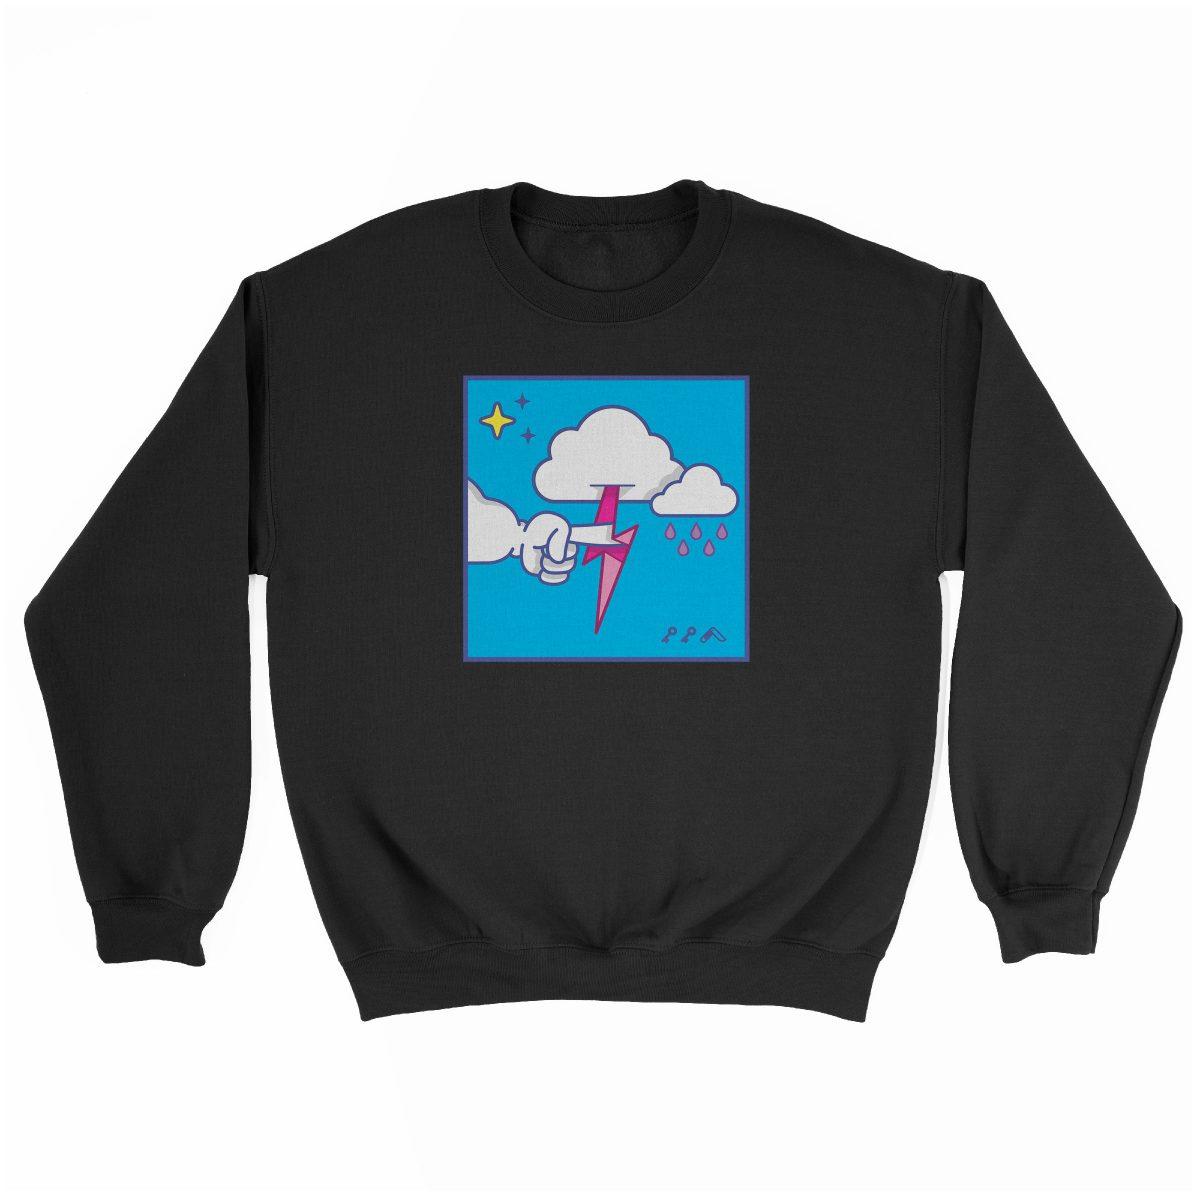 """MUTUAL CLOUDSENT"" funny adult cartoon animation style sweatshirt in black at kikicutt.com"